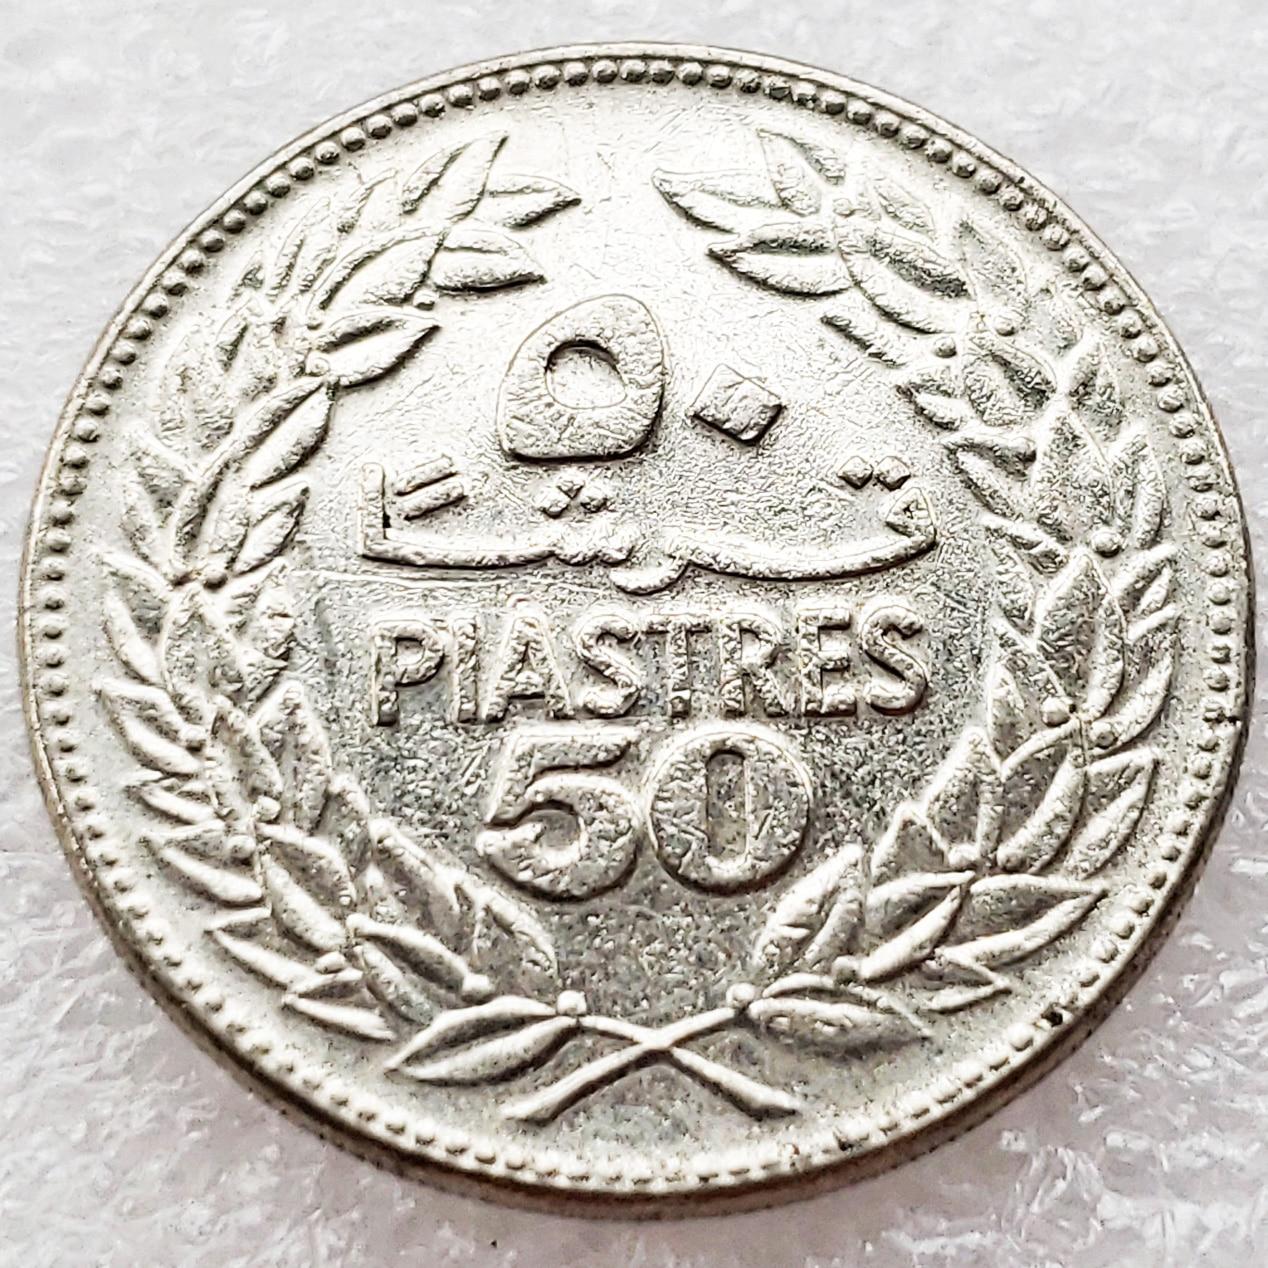 1975 Líbano 50 Piast 24mm Aisa moneda Original coleccionable edición Real monedas raras